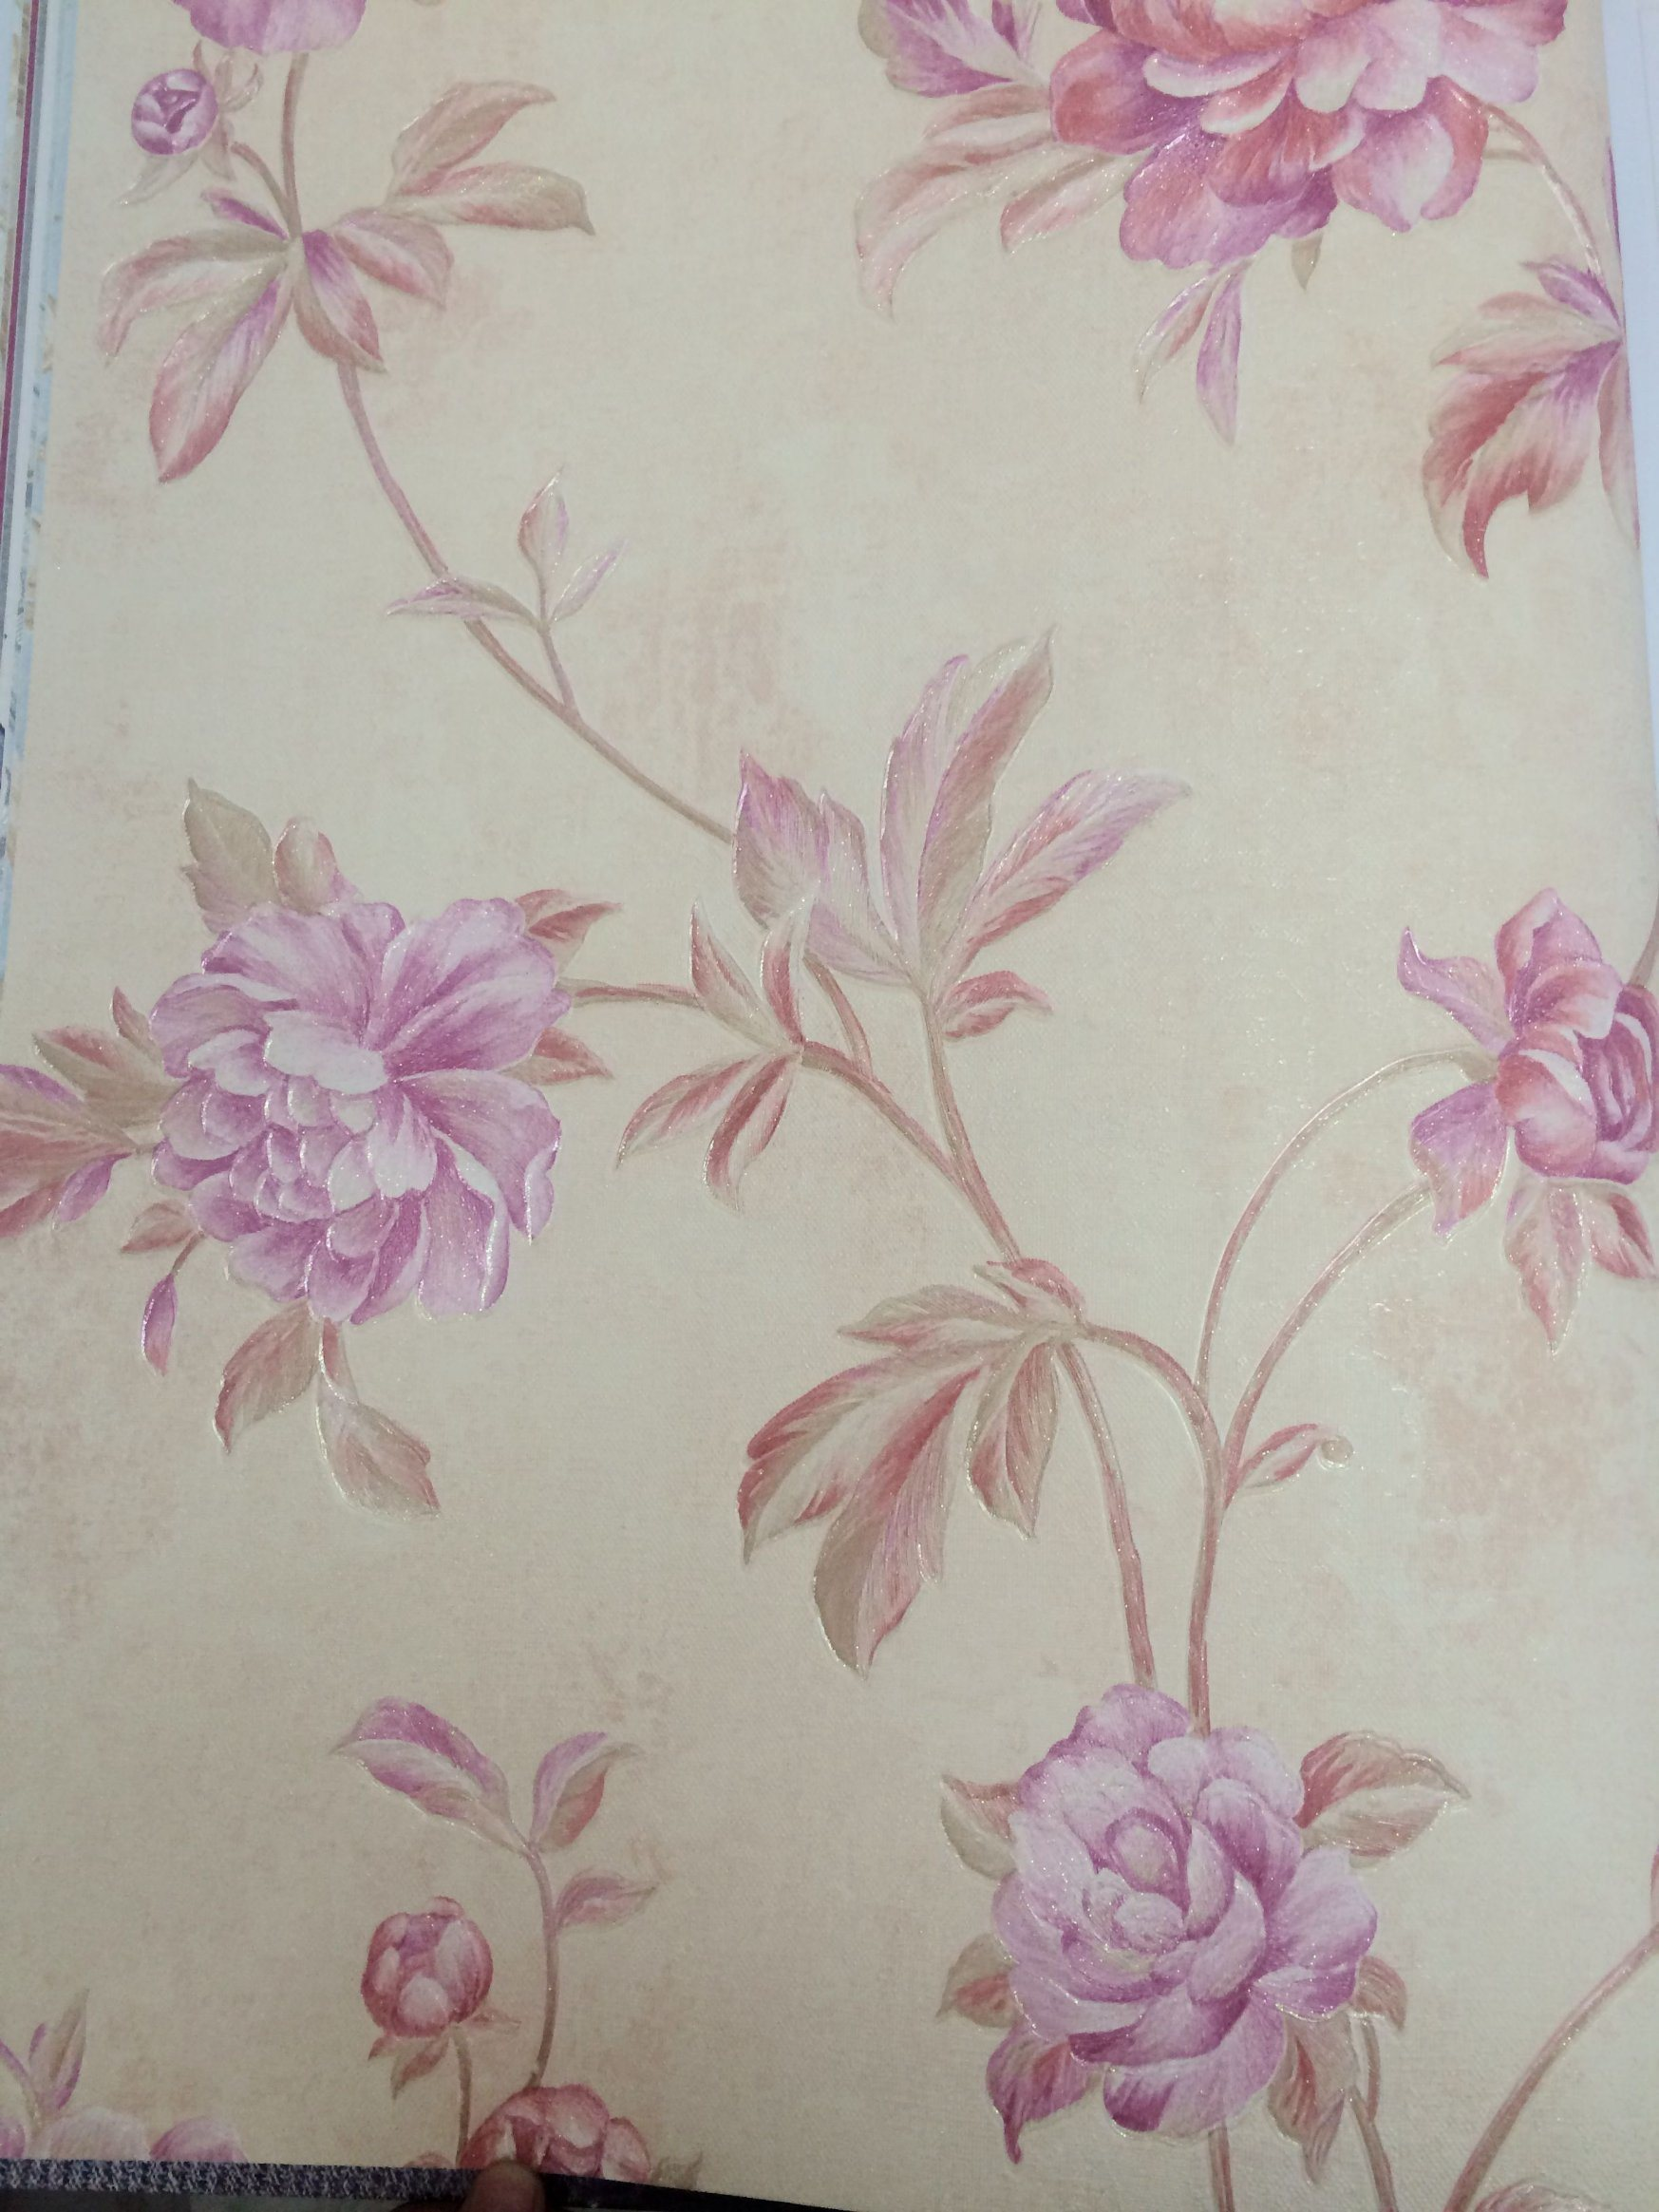 China 3d Pvc Coated Wallpaper Soft Pink Neat Stone Size